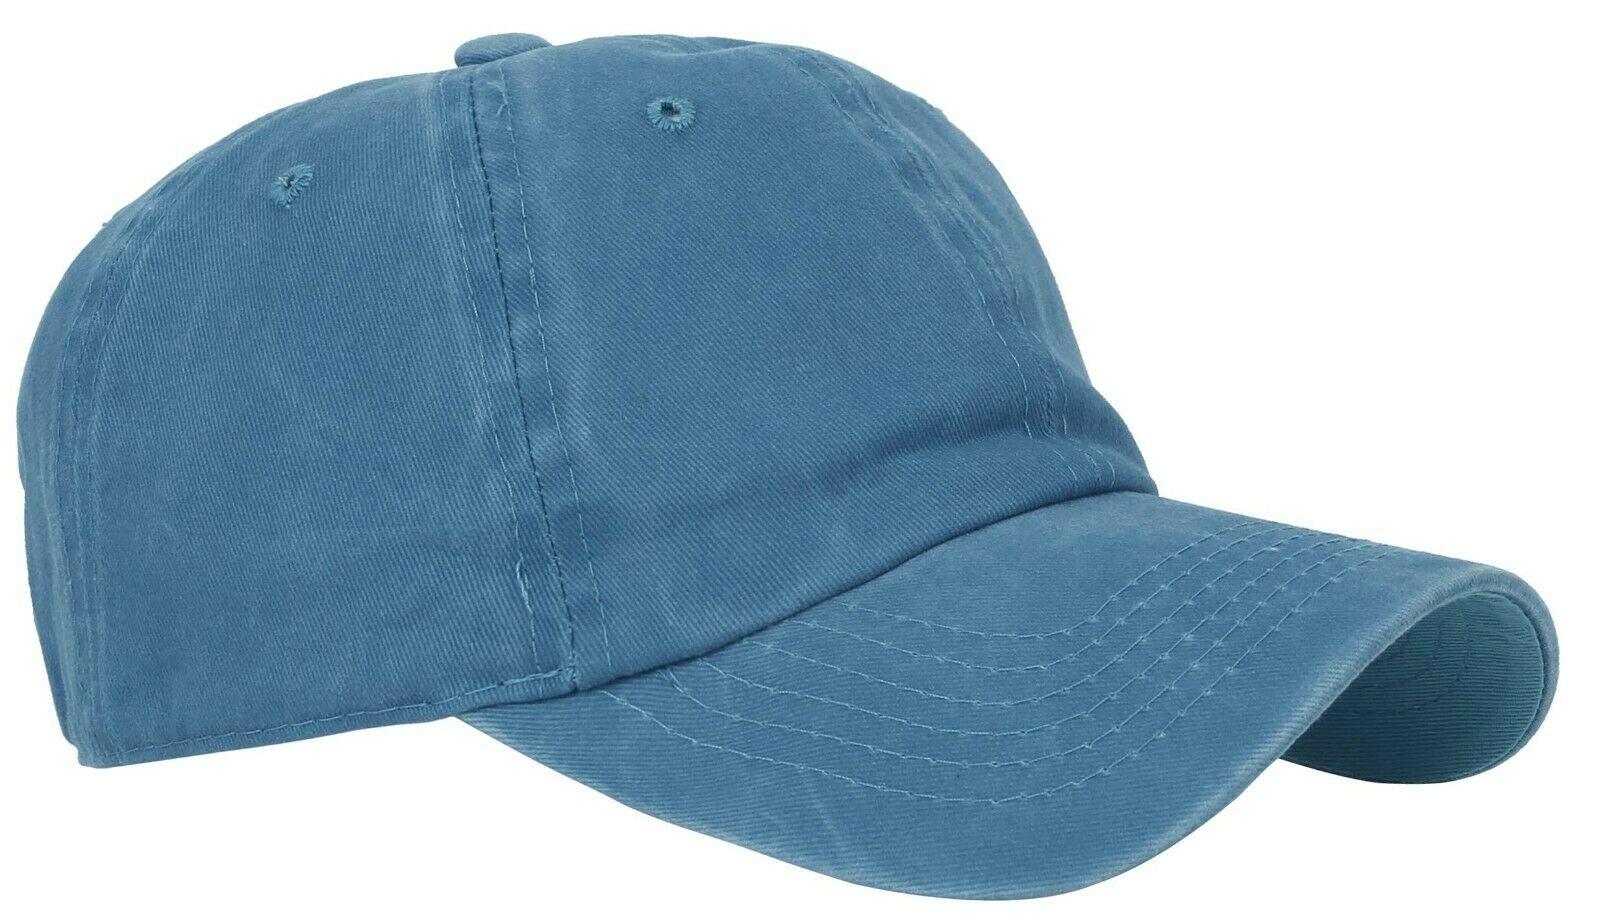 BASEBALL-CAP-Plain-Dad-Hat-Low-Profile-Vintage-Washed-Pigment-Adjustable thumbnail 19